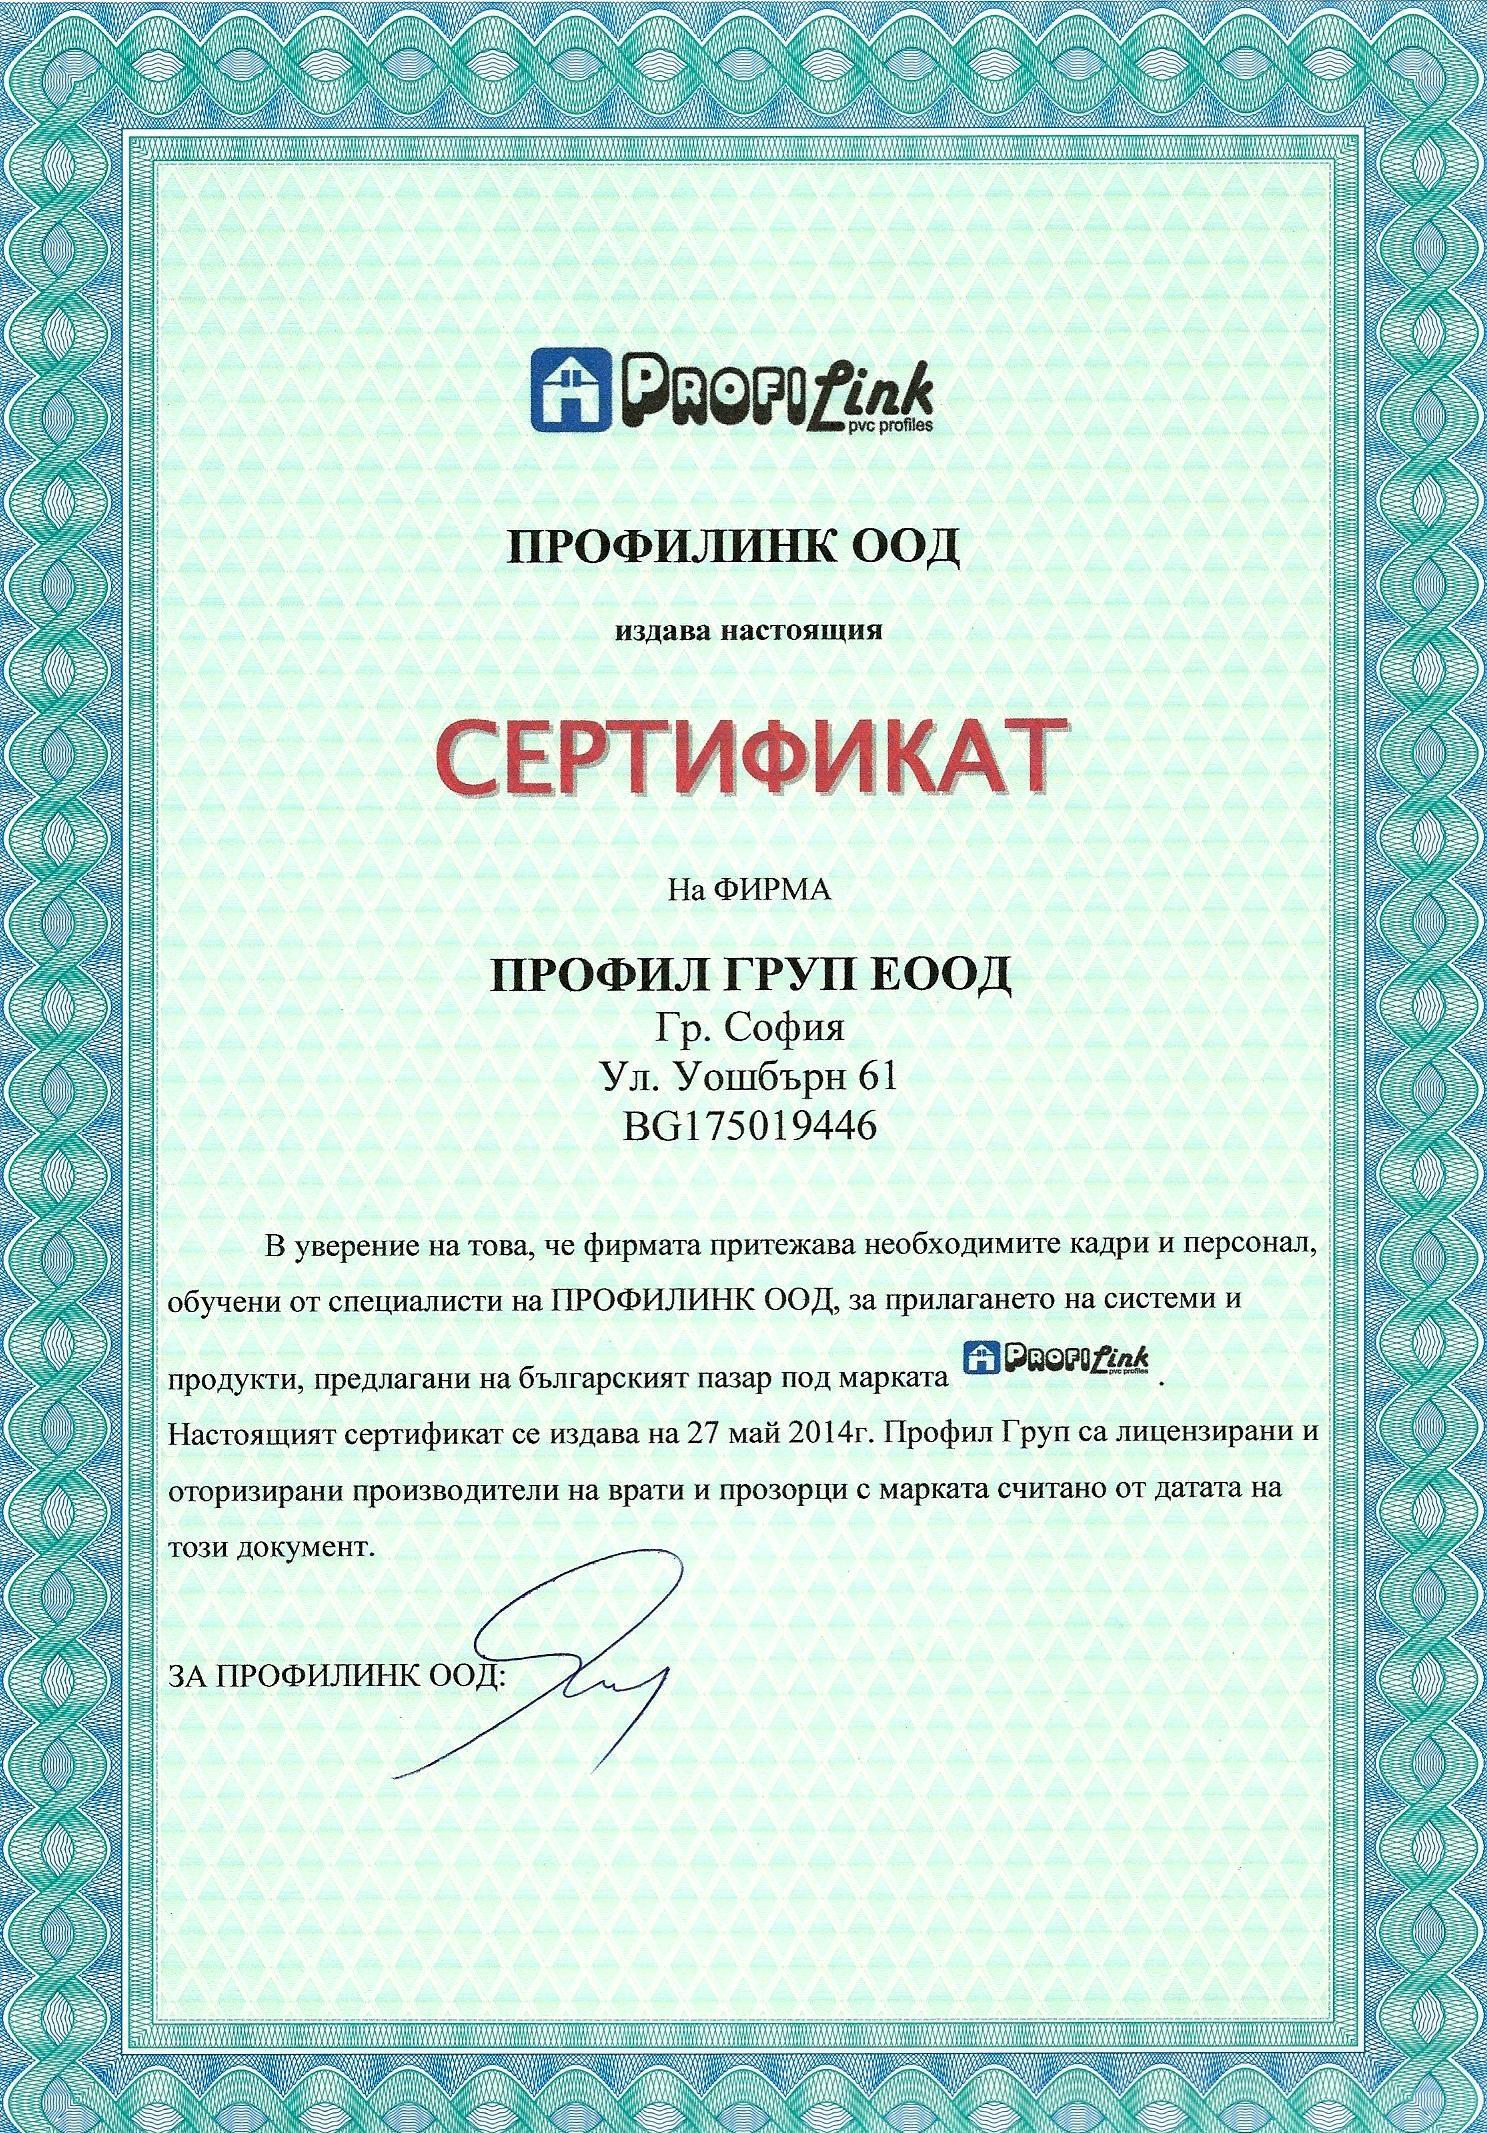 Сертификати 8